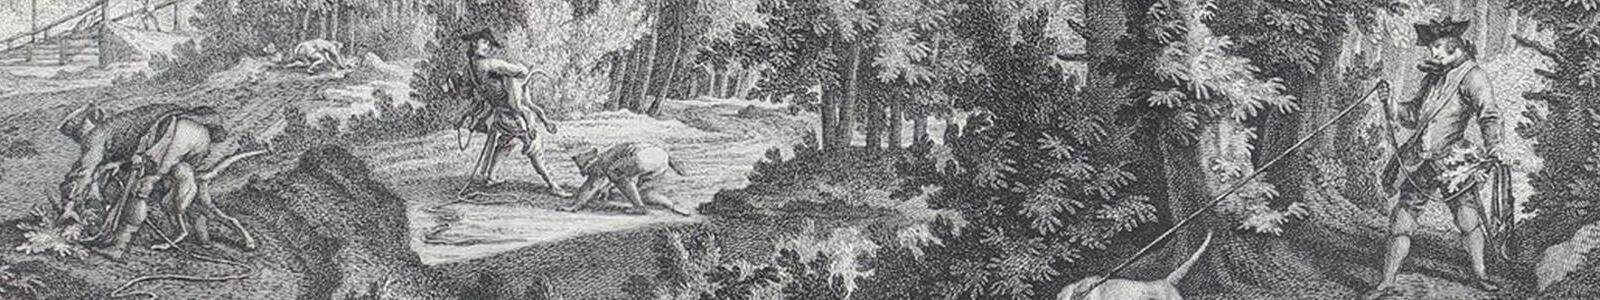 116th Auction: Art and Antiques - Part 3